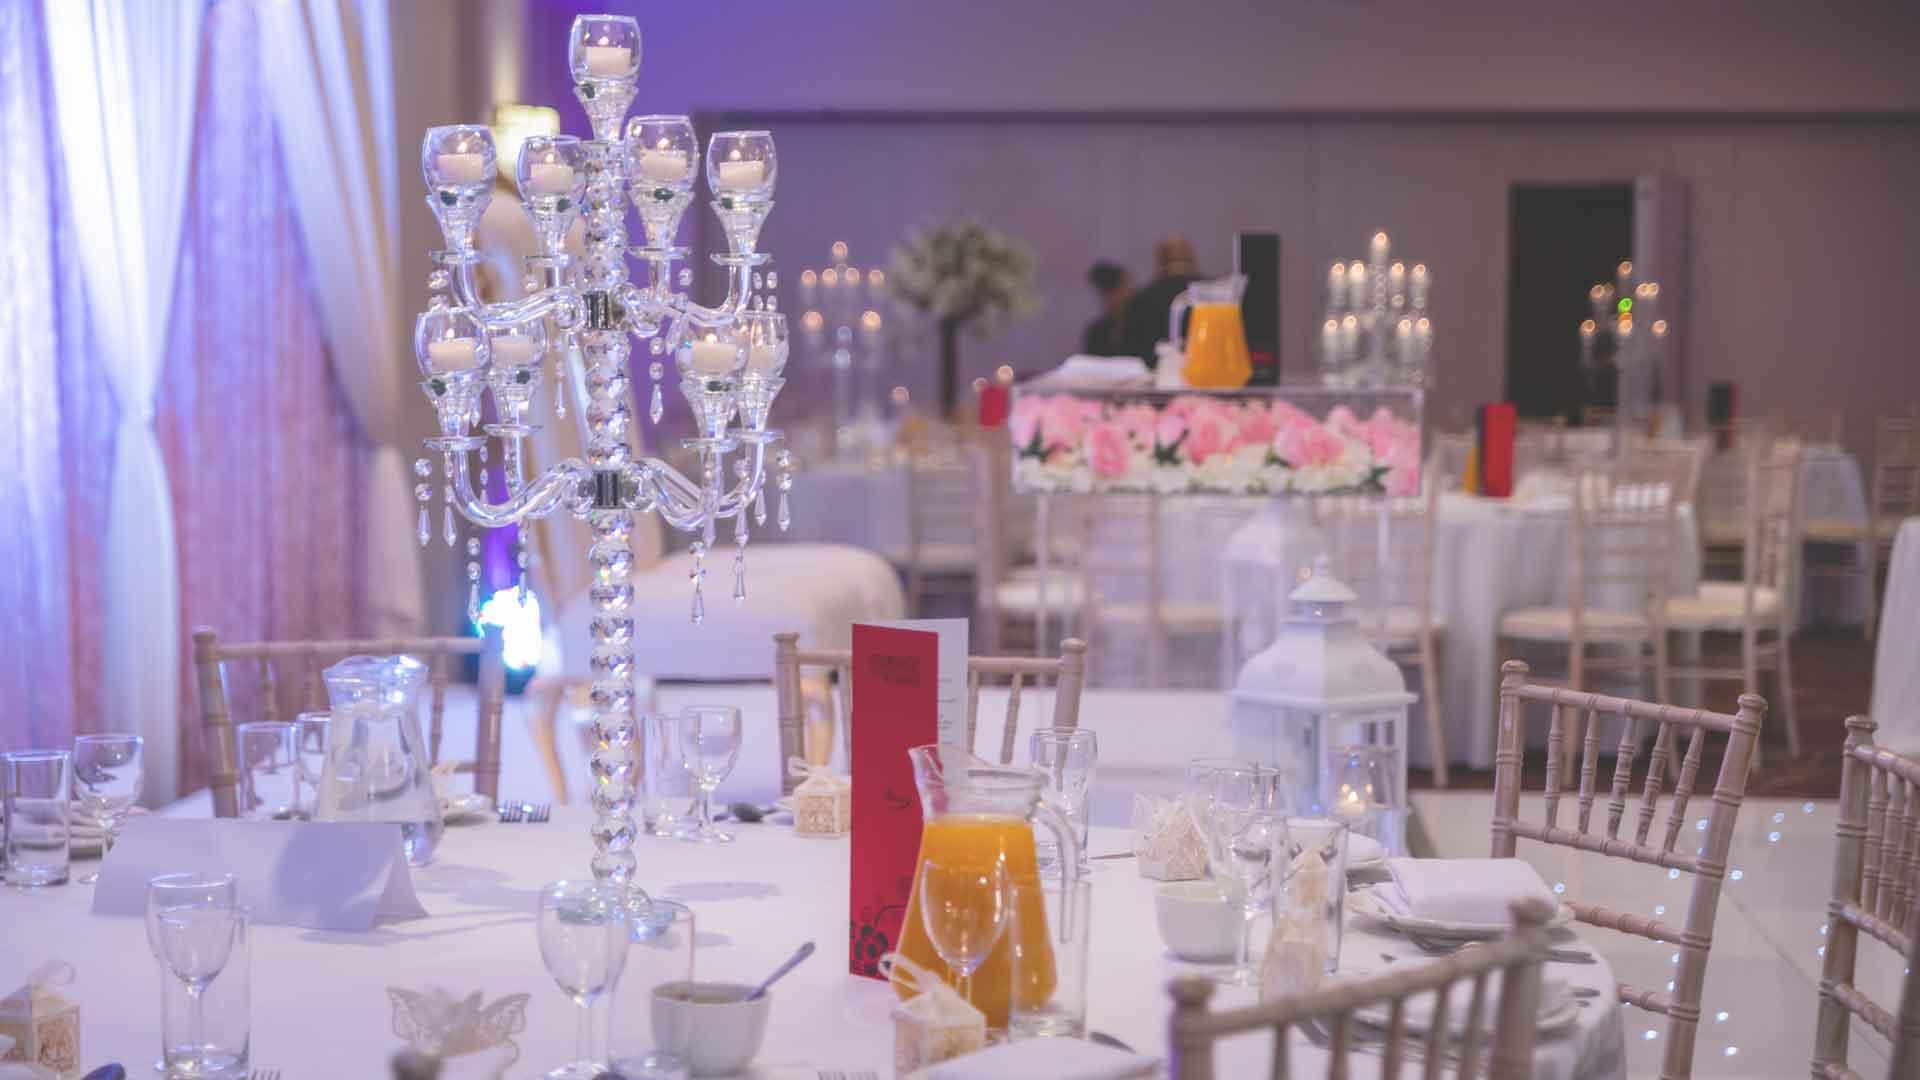 Dry Hire weddings